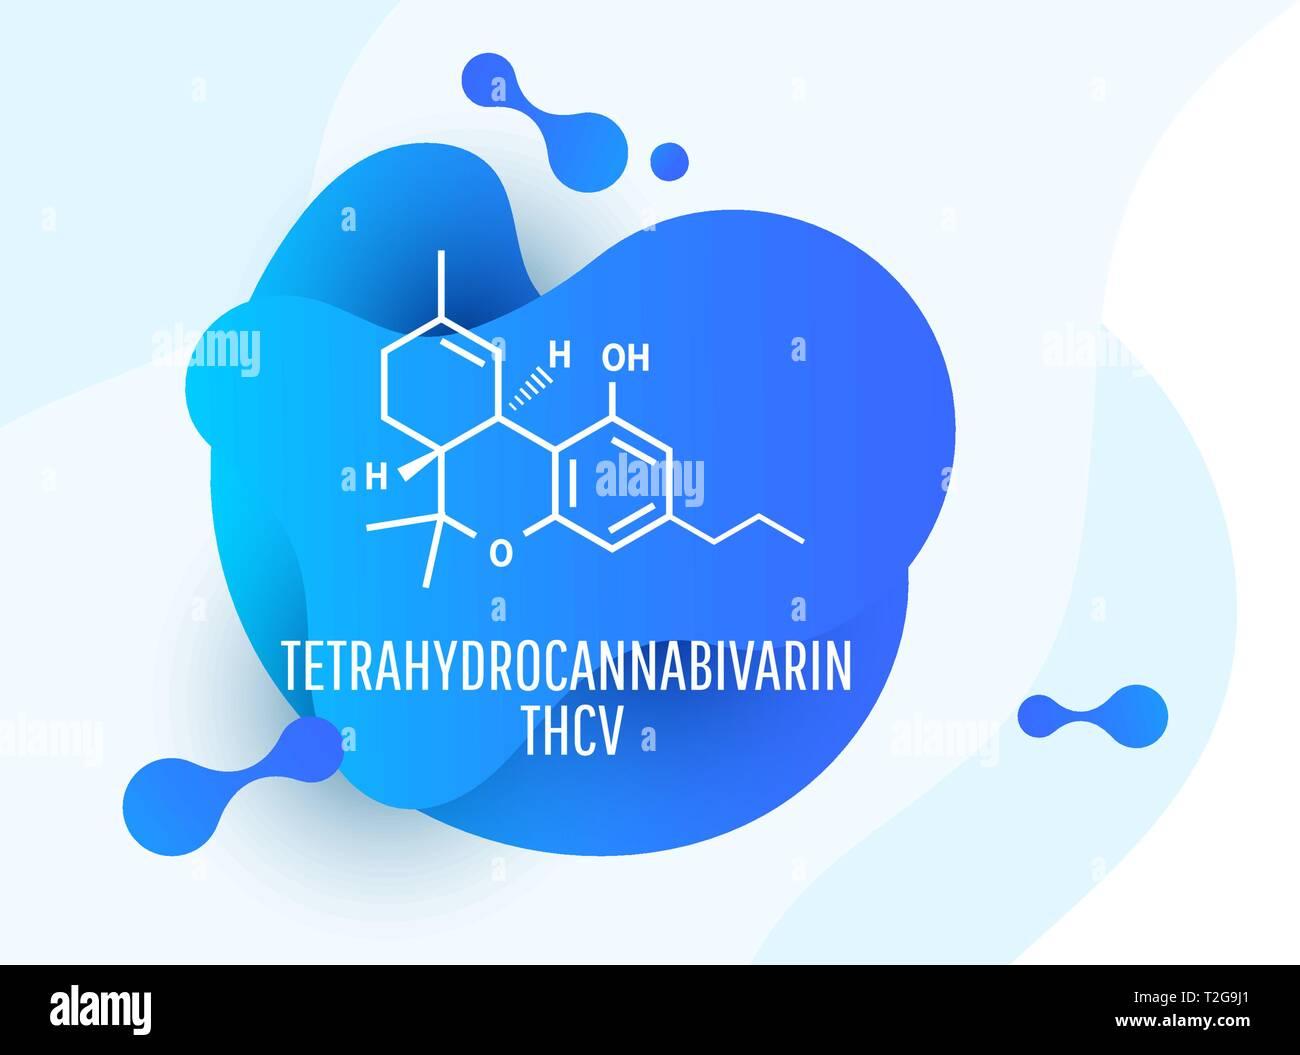 Tetrahydrocannabivarin Chemical formulas of natural cannabinoids. - Stock Image